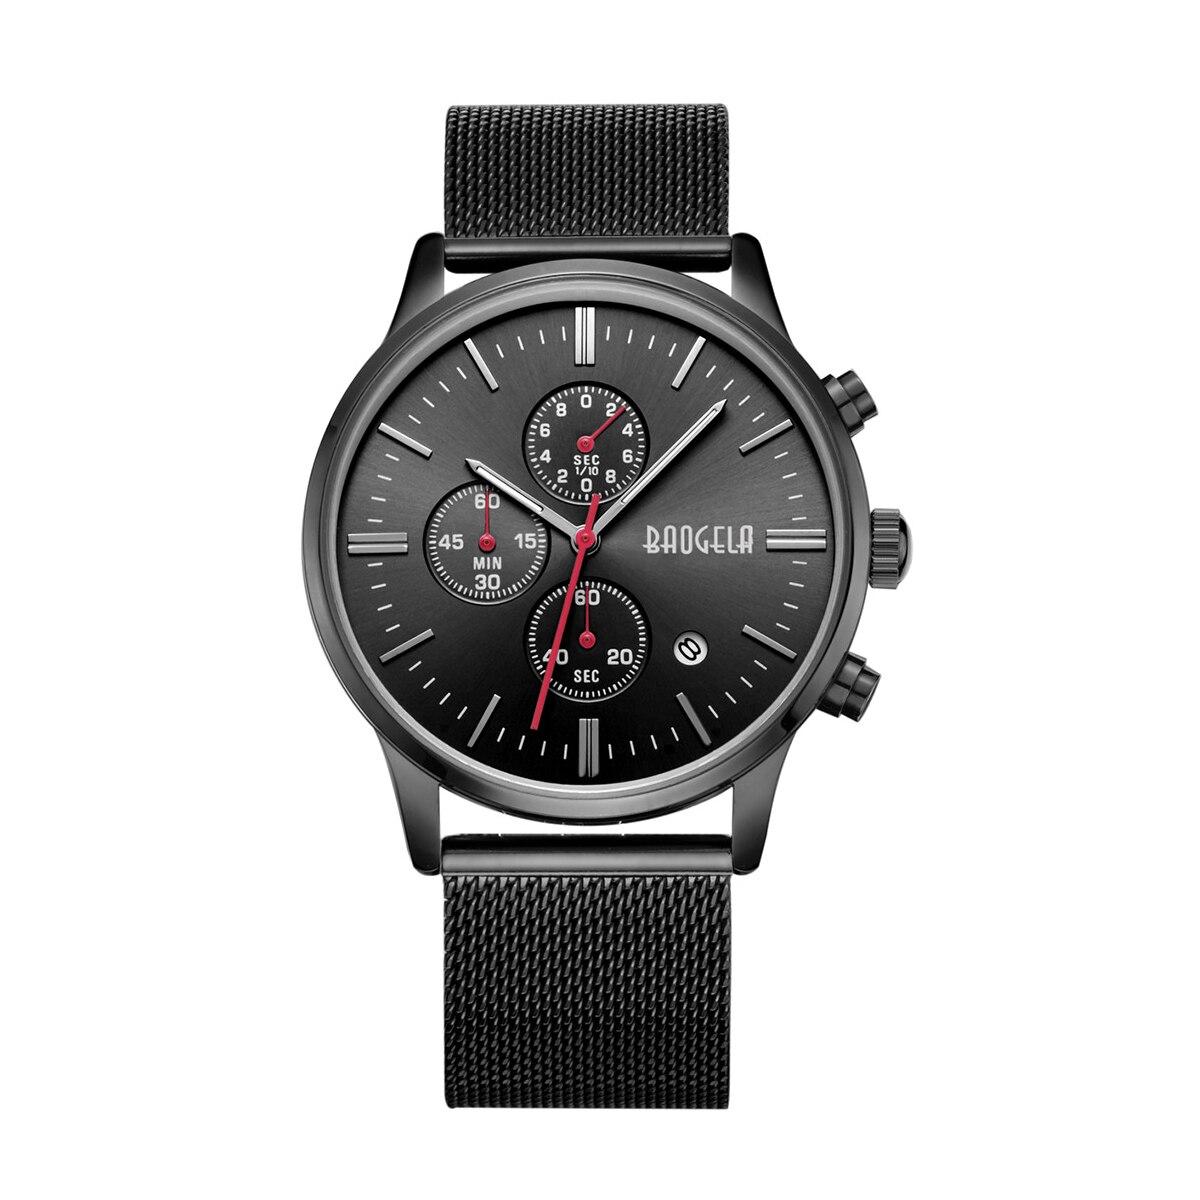 цена на BAOGELA Mens Chronograph Stainless Steel Mesh Strap Sport Quartz Wrist Watches with Luminous Hands 1611